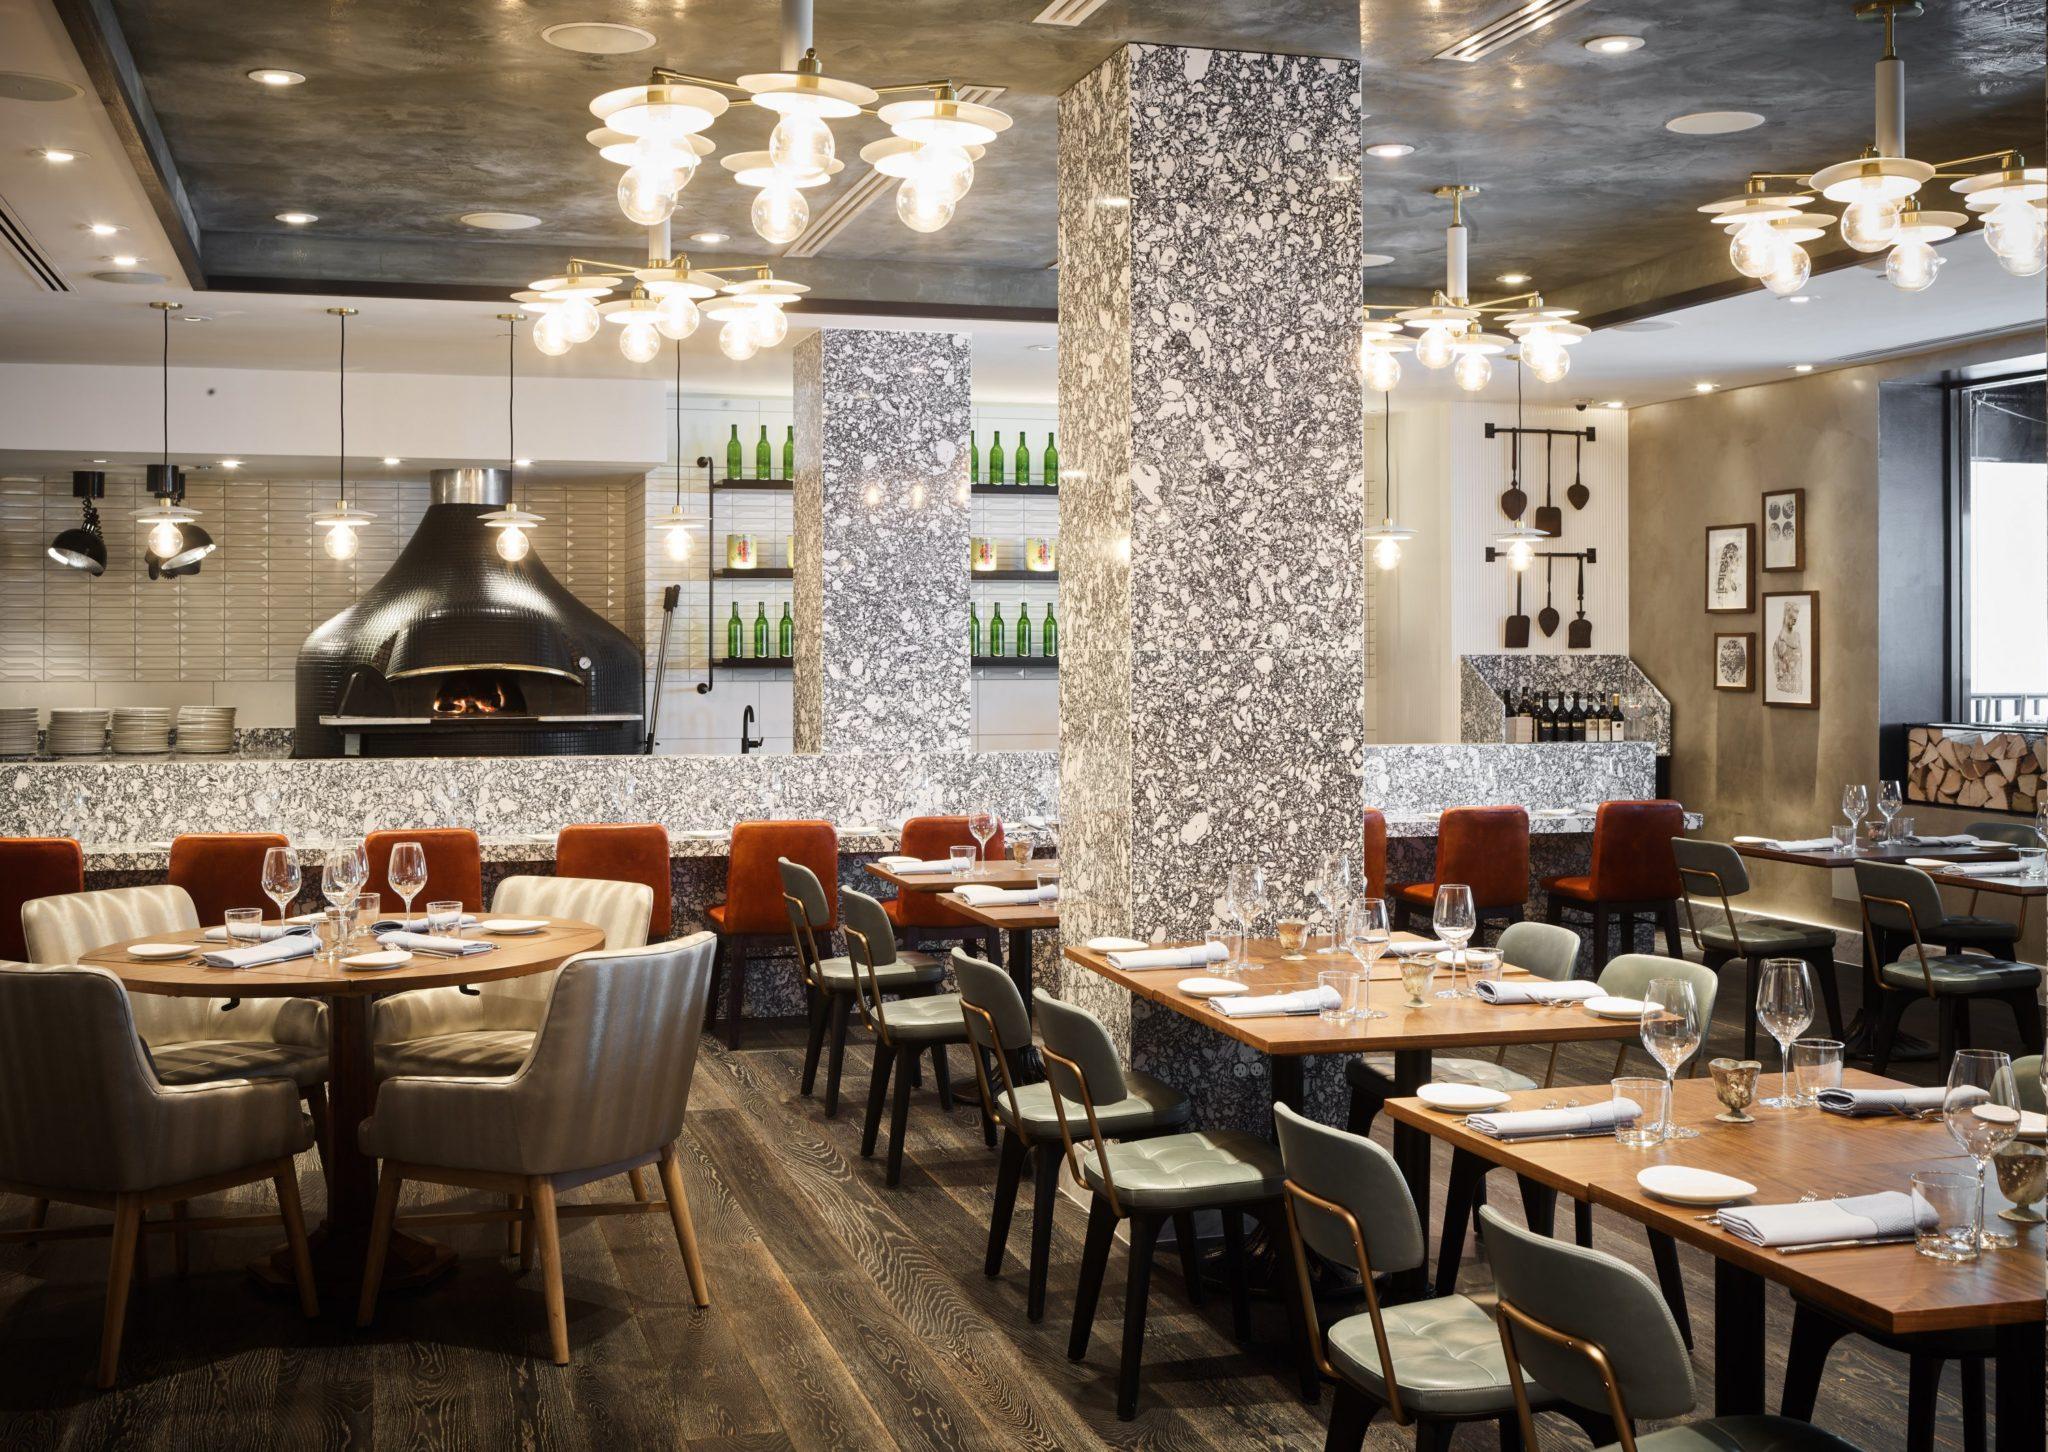 Inside Downtown Dcs New Italian Restaurant And Illuminati Inspired Luxe Micro Bar